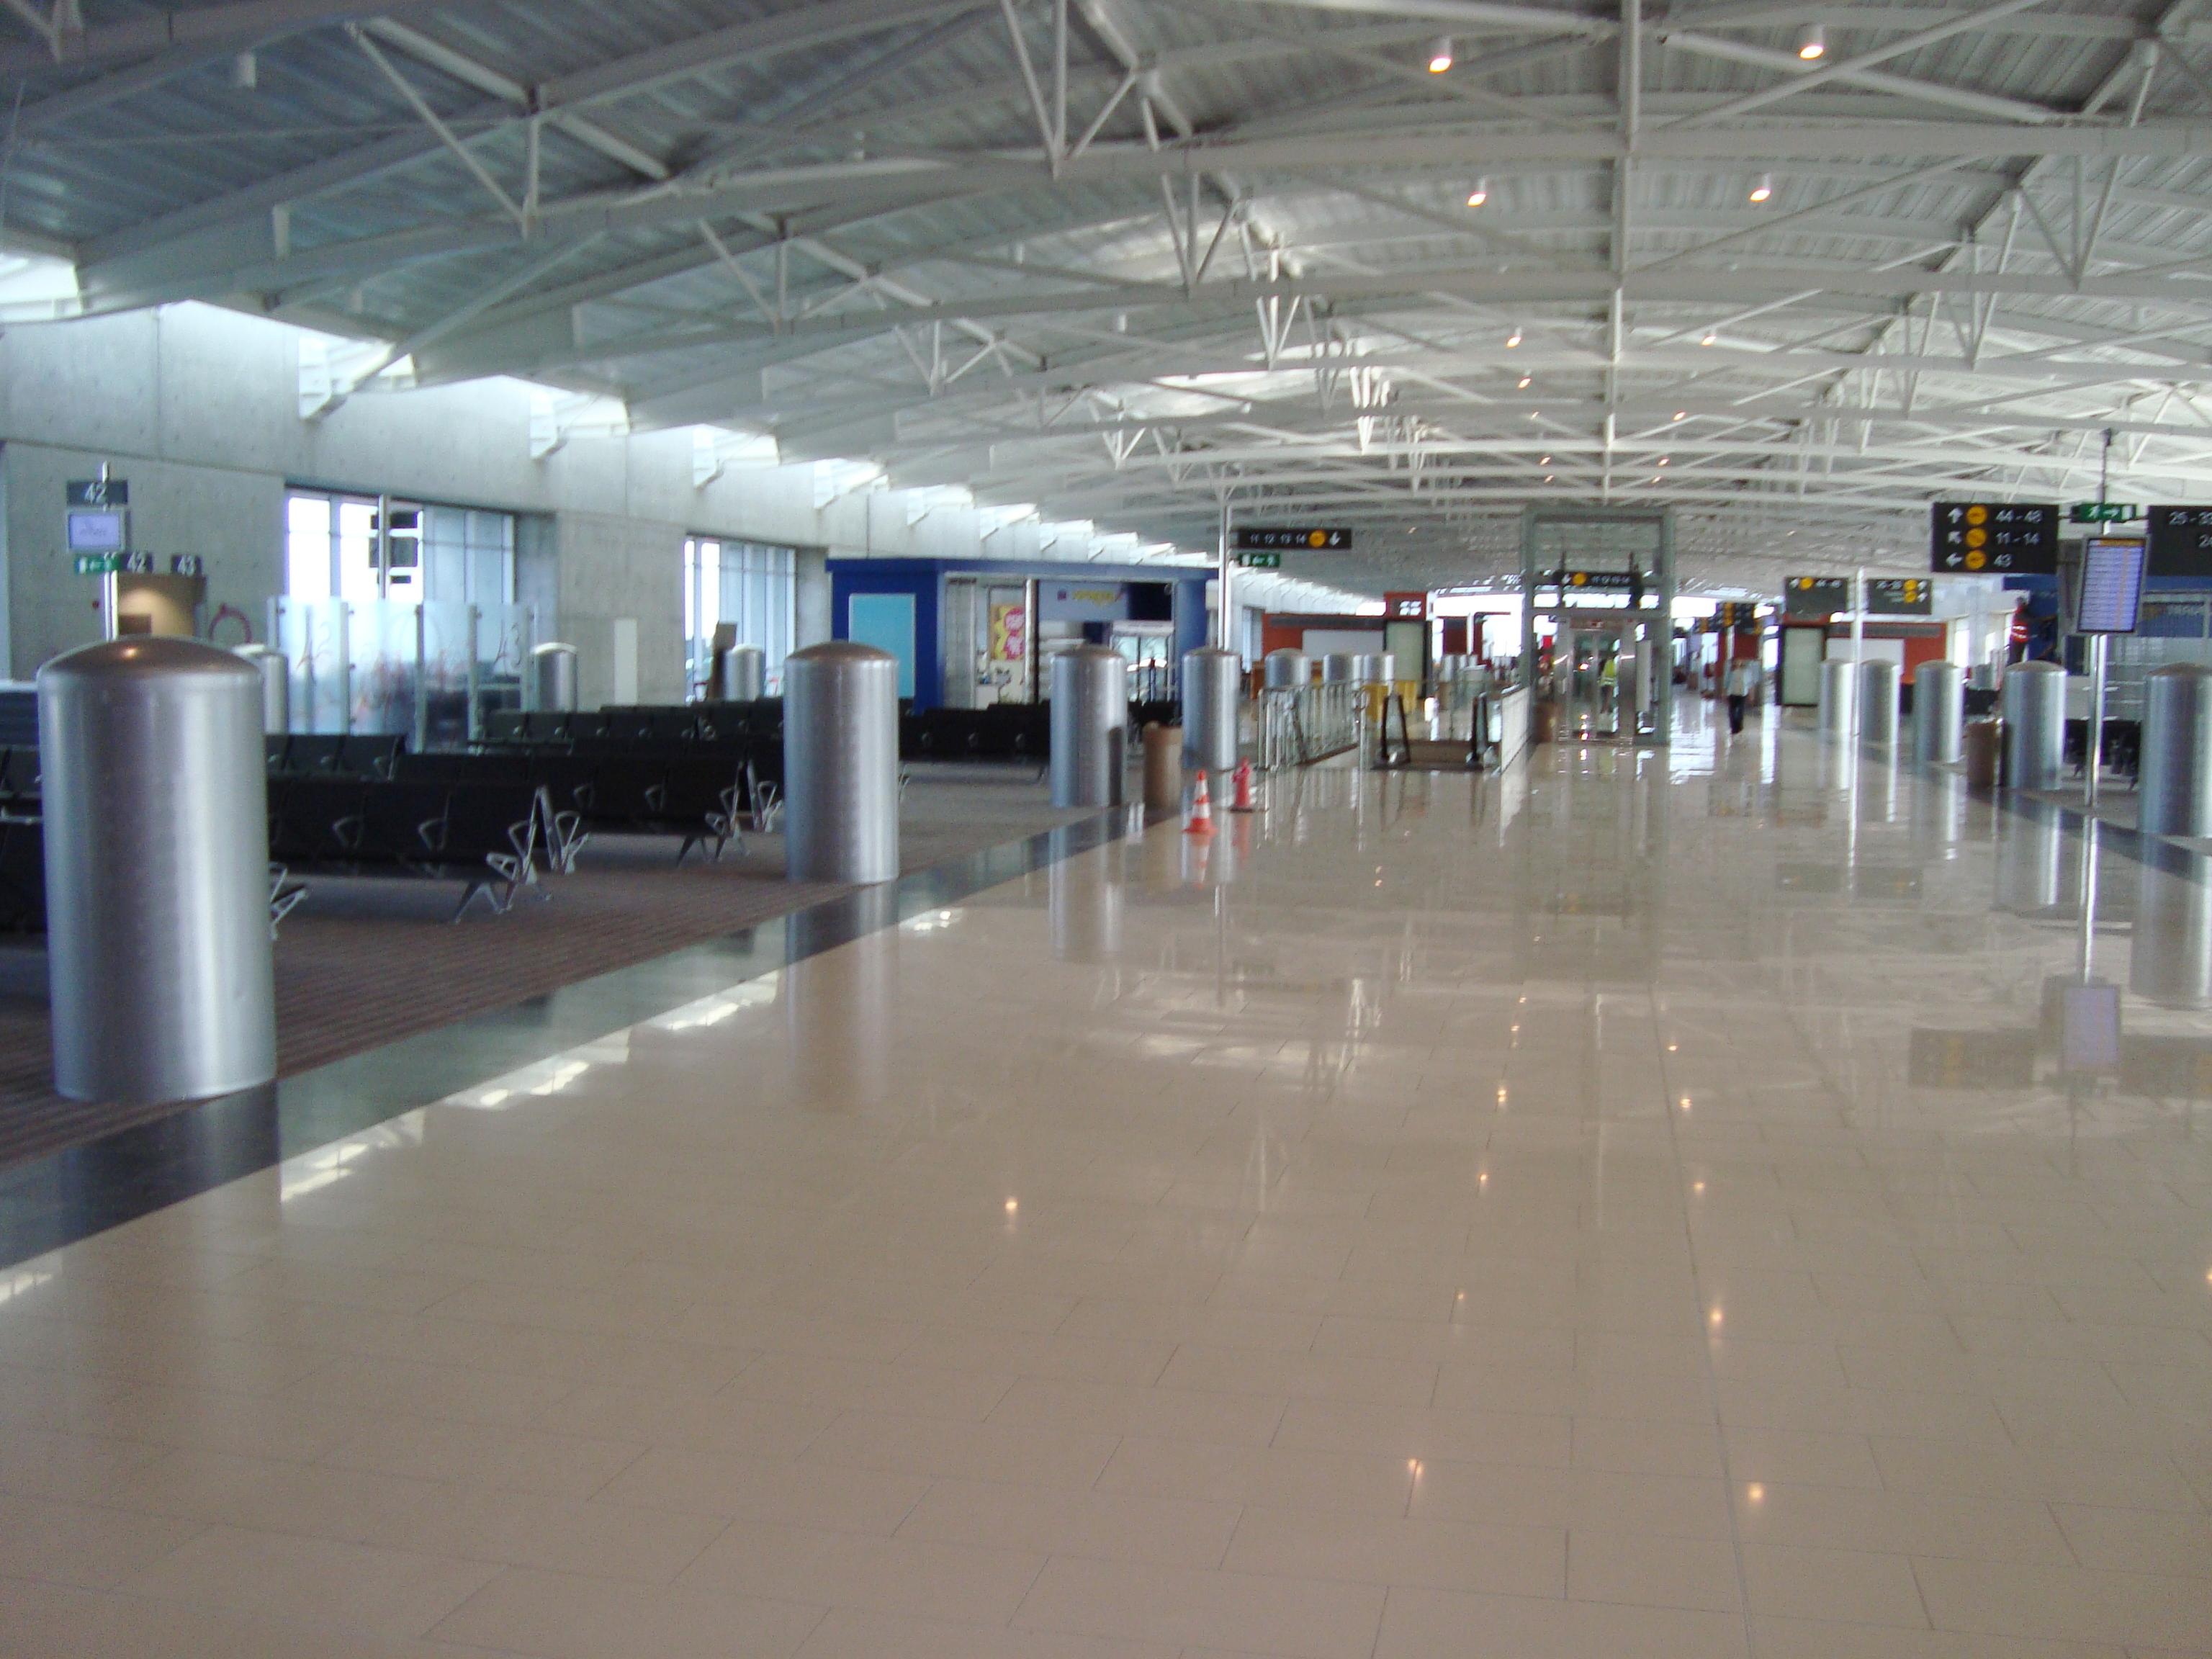 Mogadishu airport pic somalinet forums for International decor gates